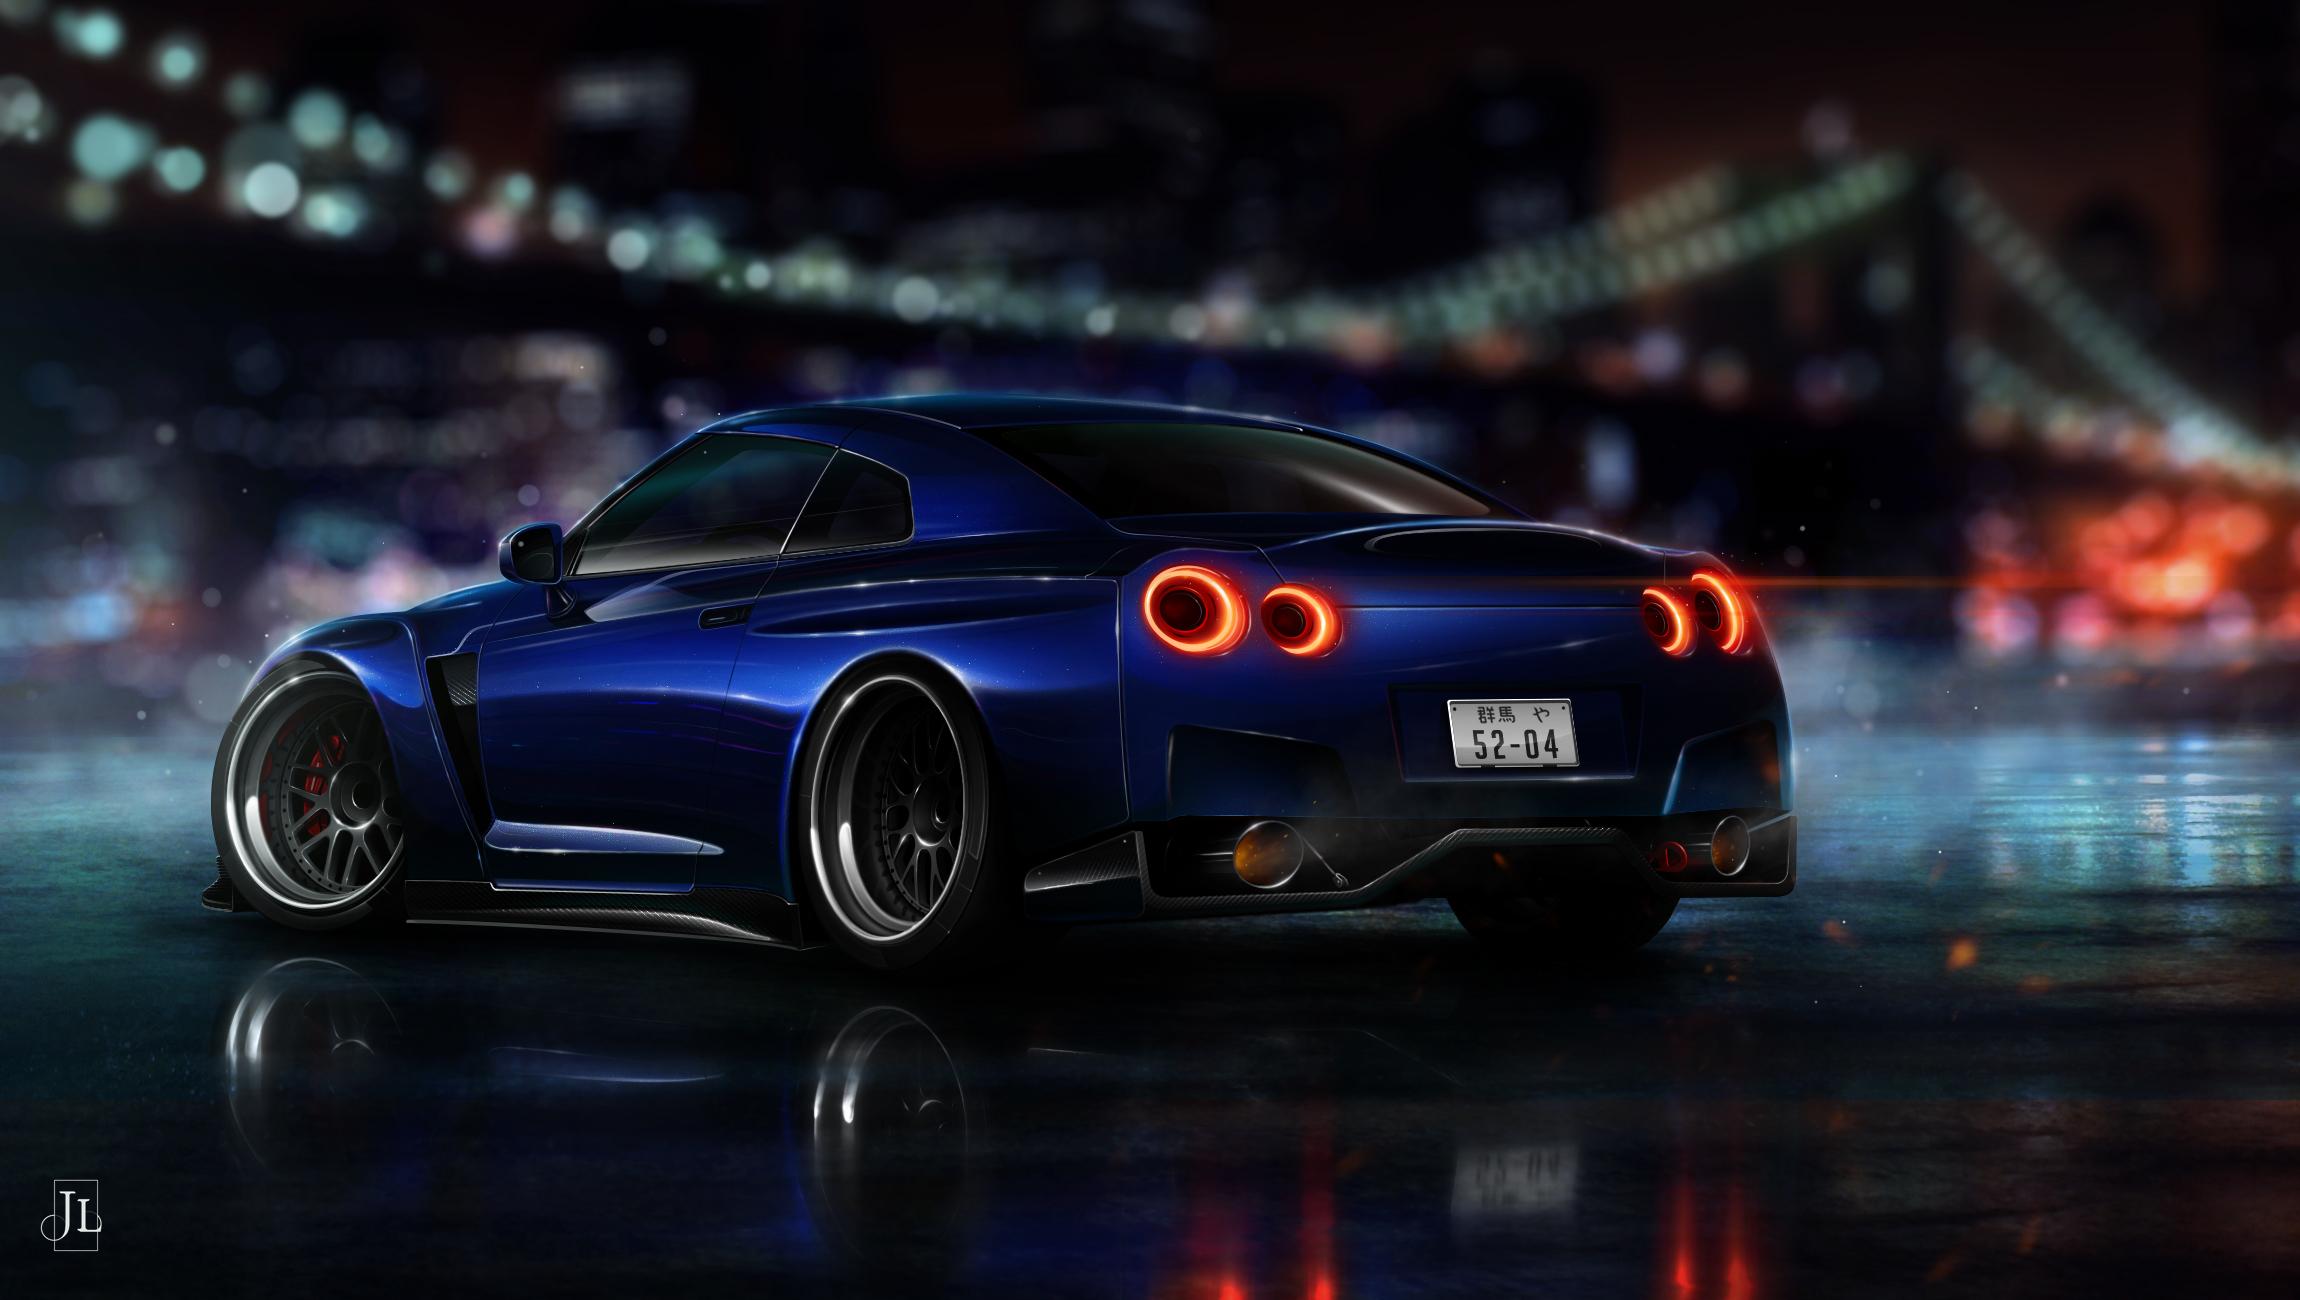 Nfs 2015 Nissan Gtr By Jay5204 On Deviantart